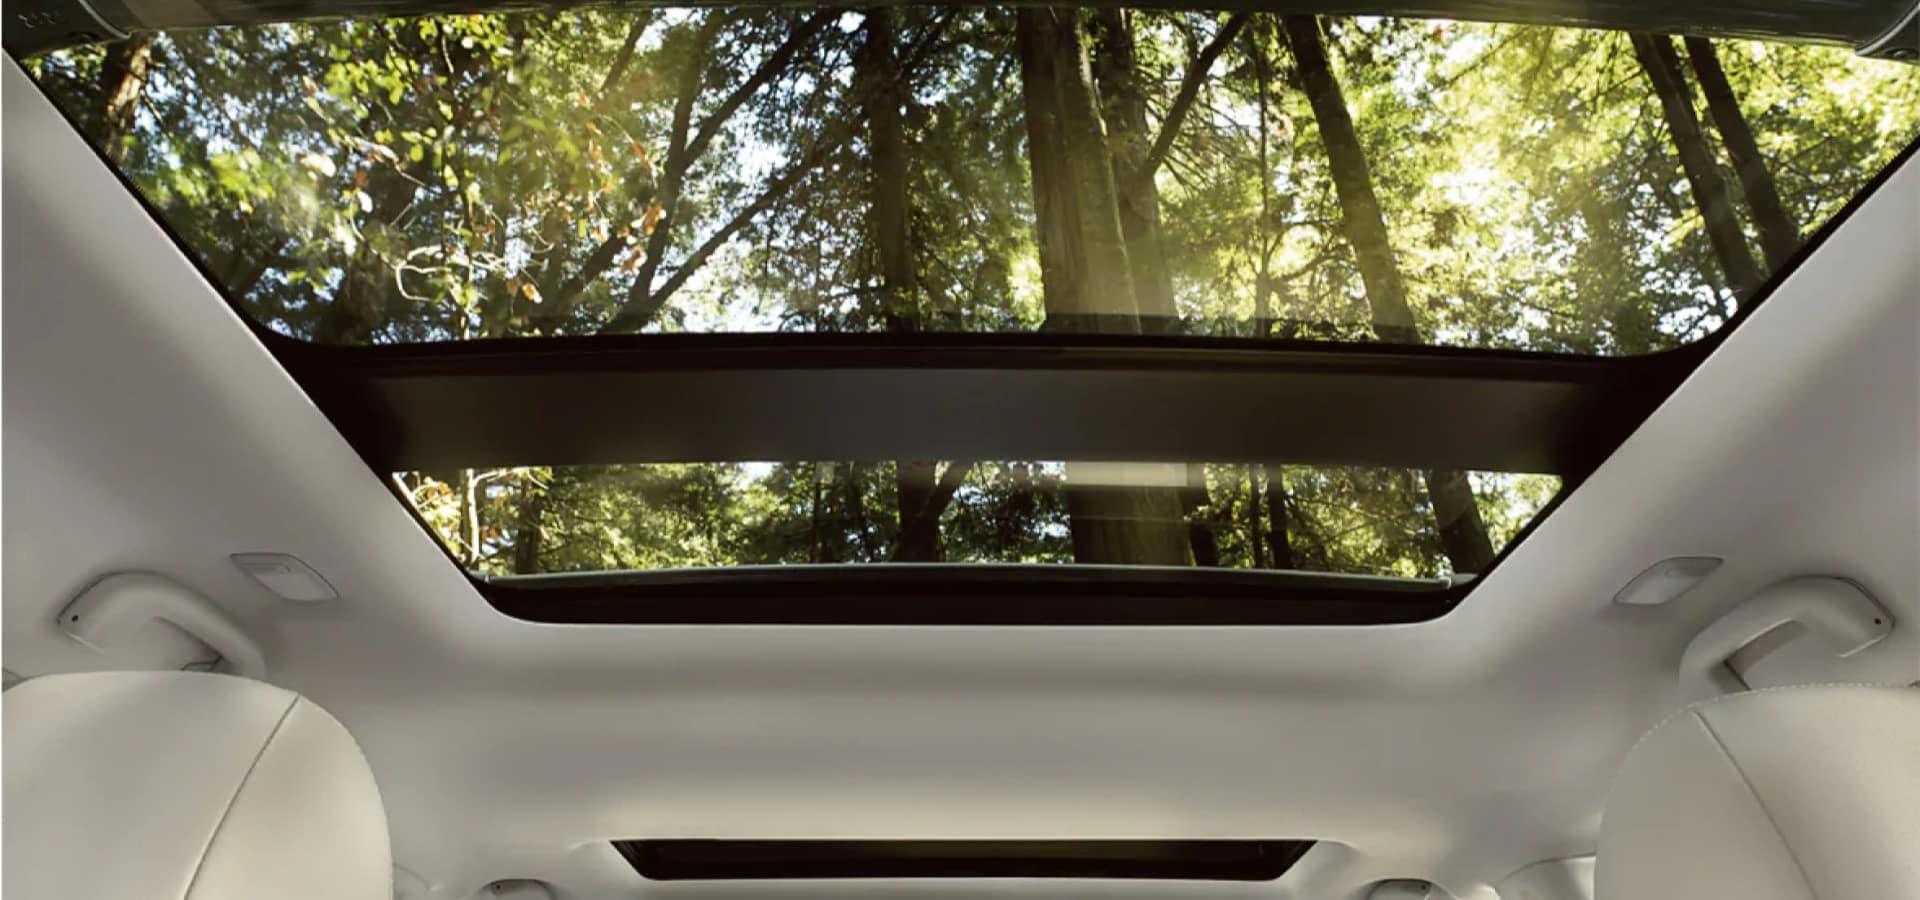 Nissan_Pathfinder_Interior_Sunroof